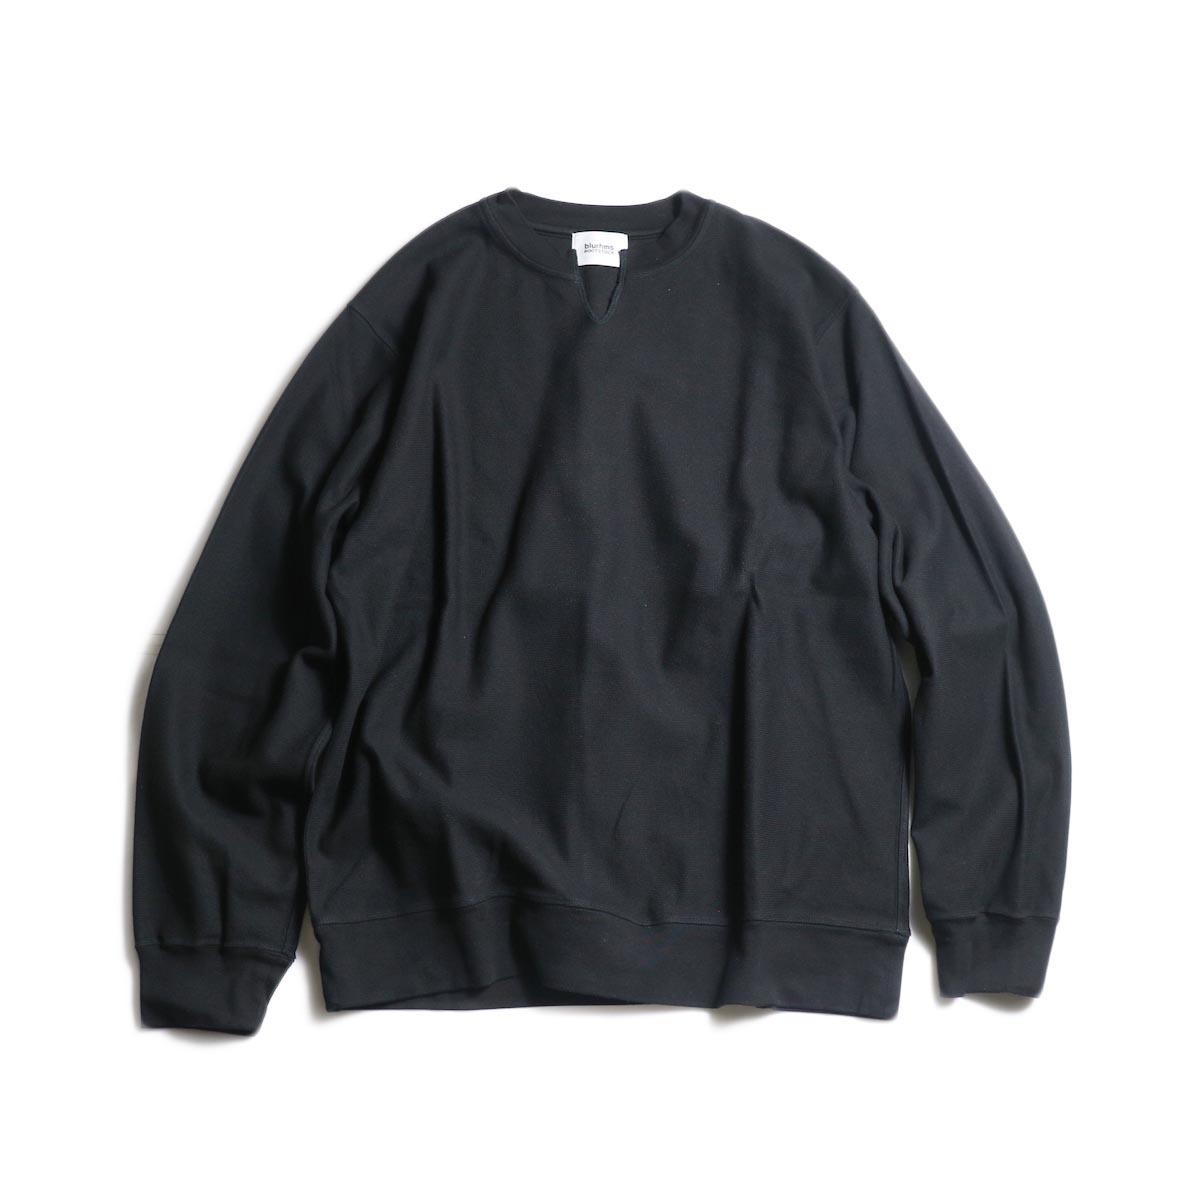 blurhms / Raschel Cut-Off V-Neck P/O (Black)